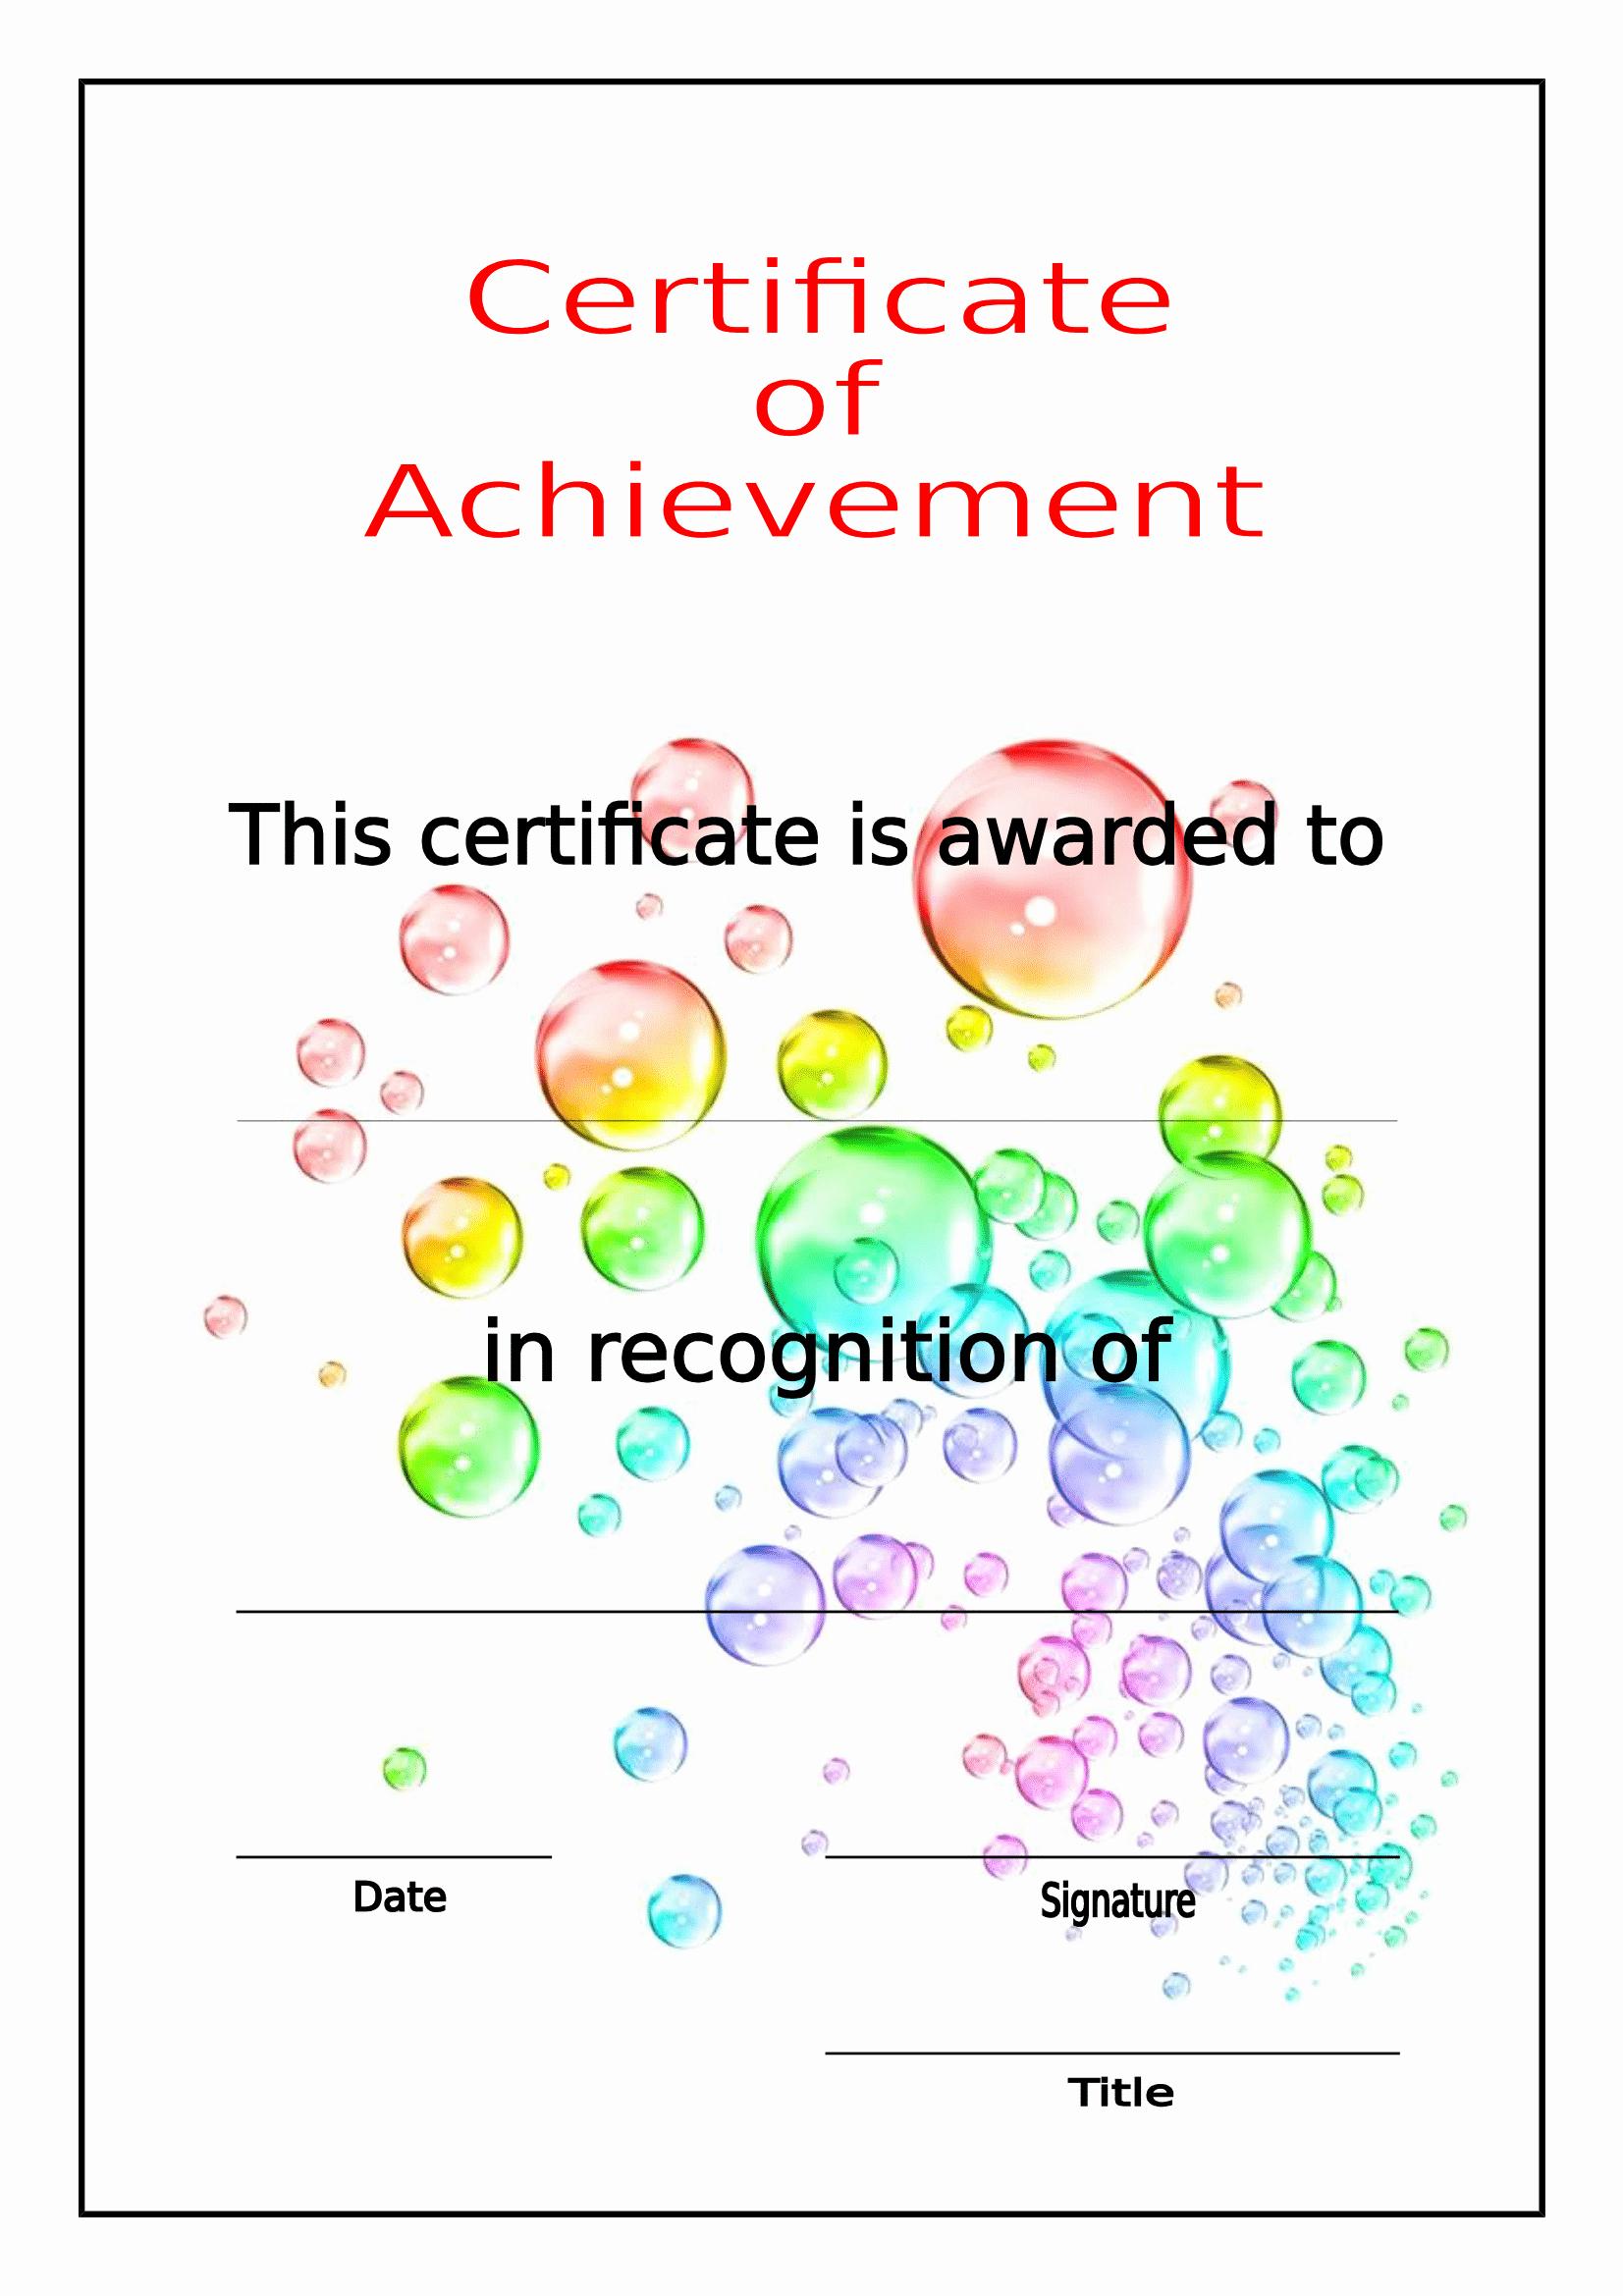 Certificate Of Achievement Template Free Unique Certificates Download Free Business Letter Templates